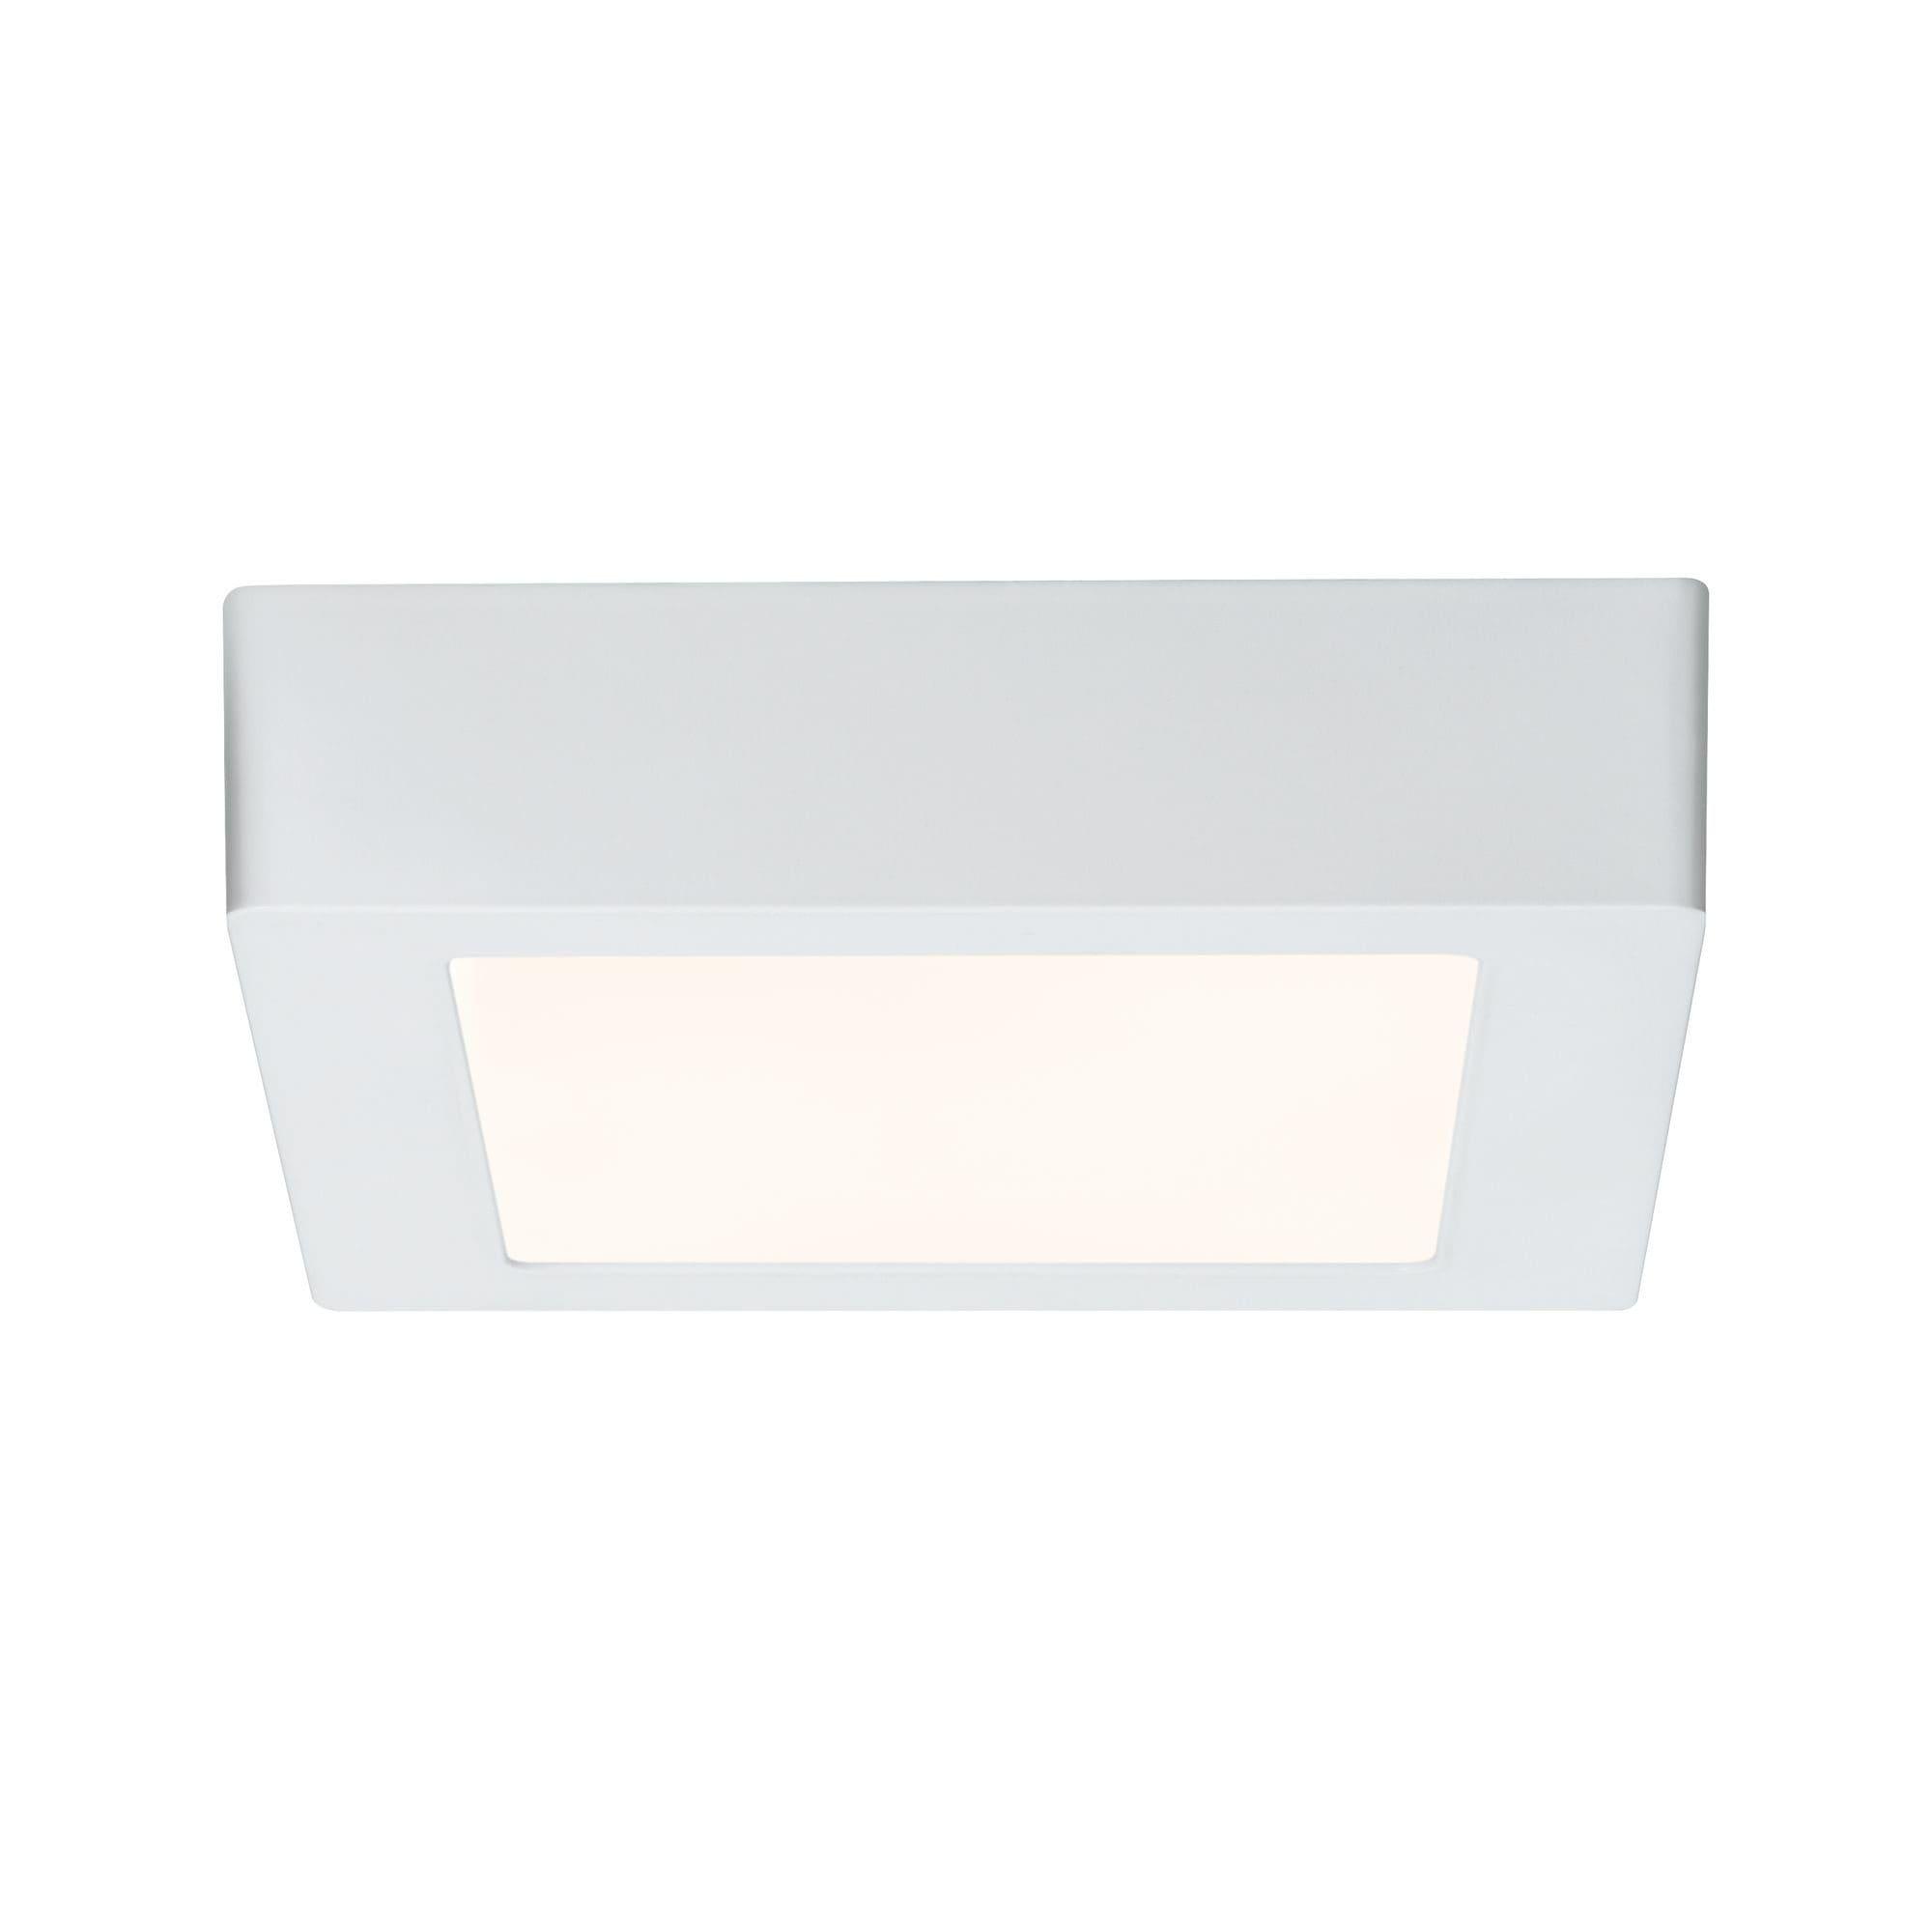 Paulmann LED Deckenleuchte Lunar Panel eckig 170x170 mm 11W Weiß matt Alu, 1 St., Warmweiß